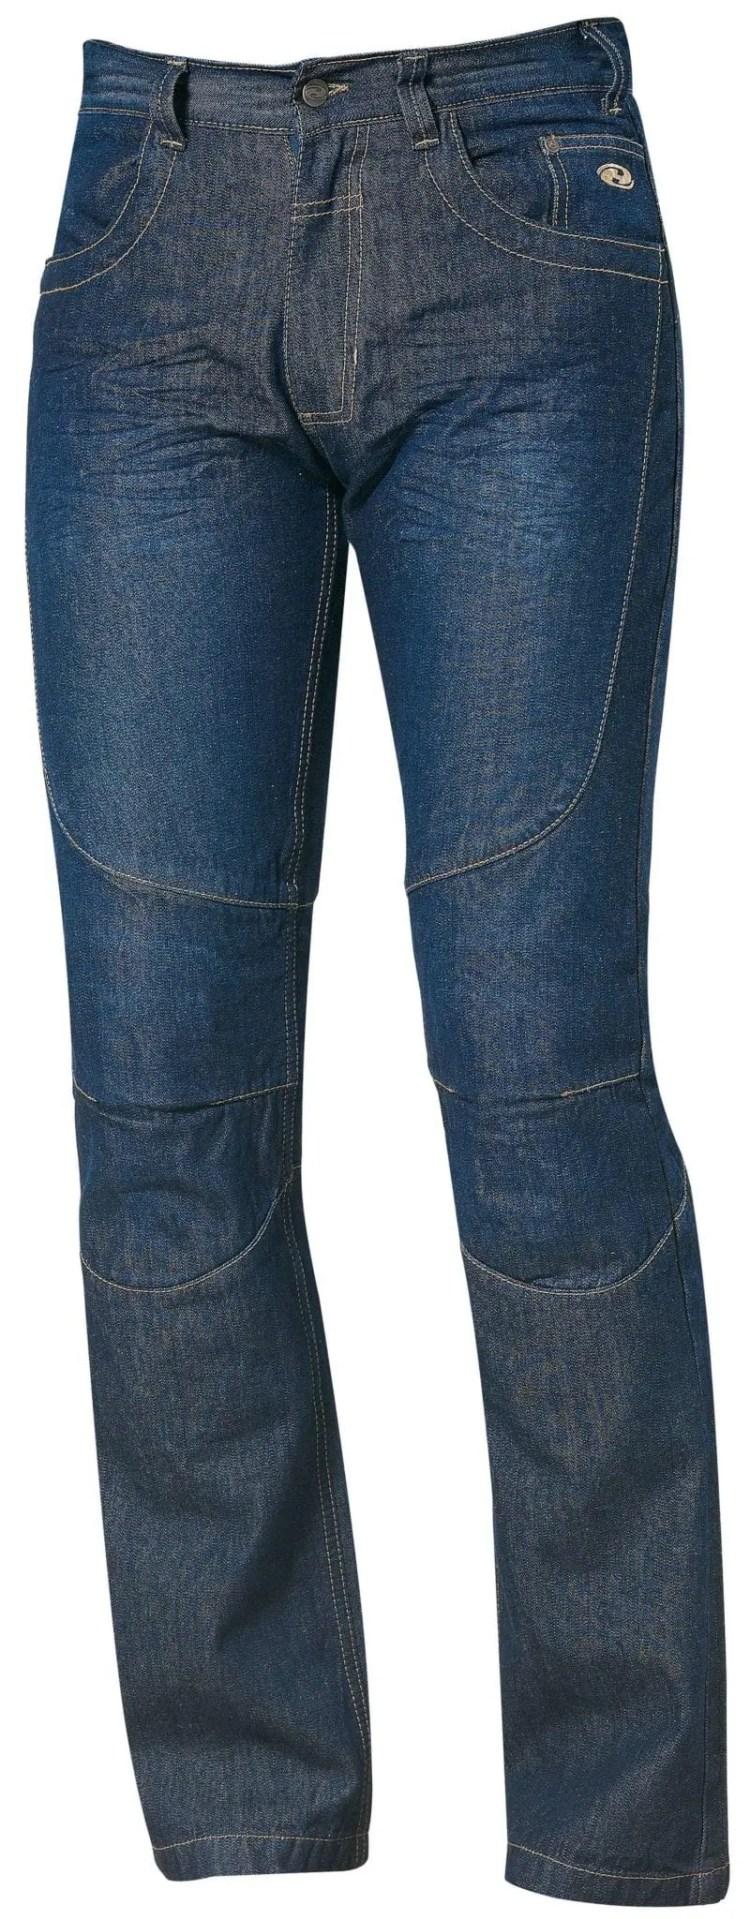 generic-jeans